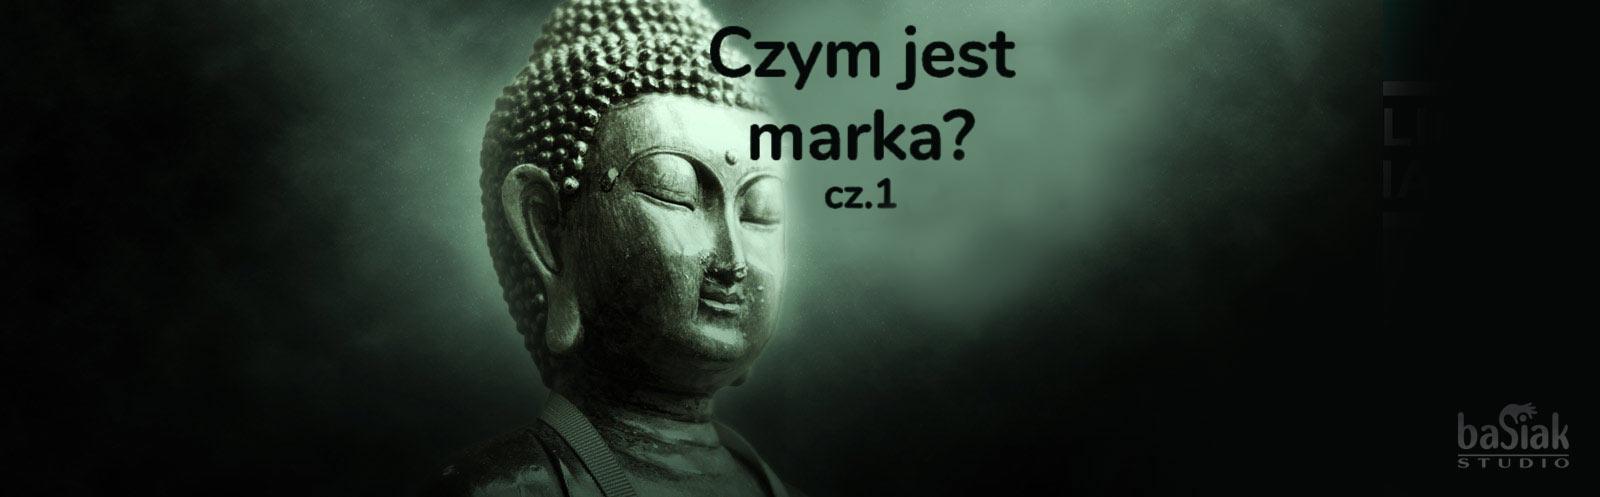 Aspekt duchowy, idea marki